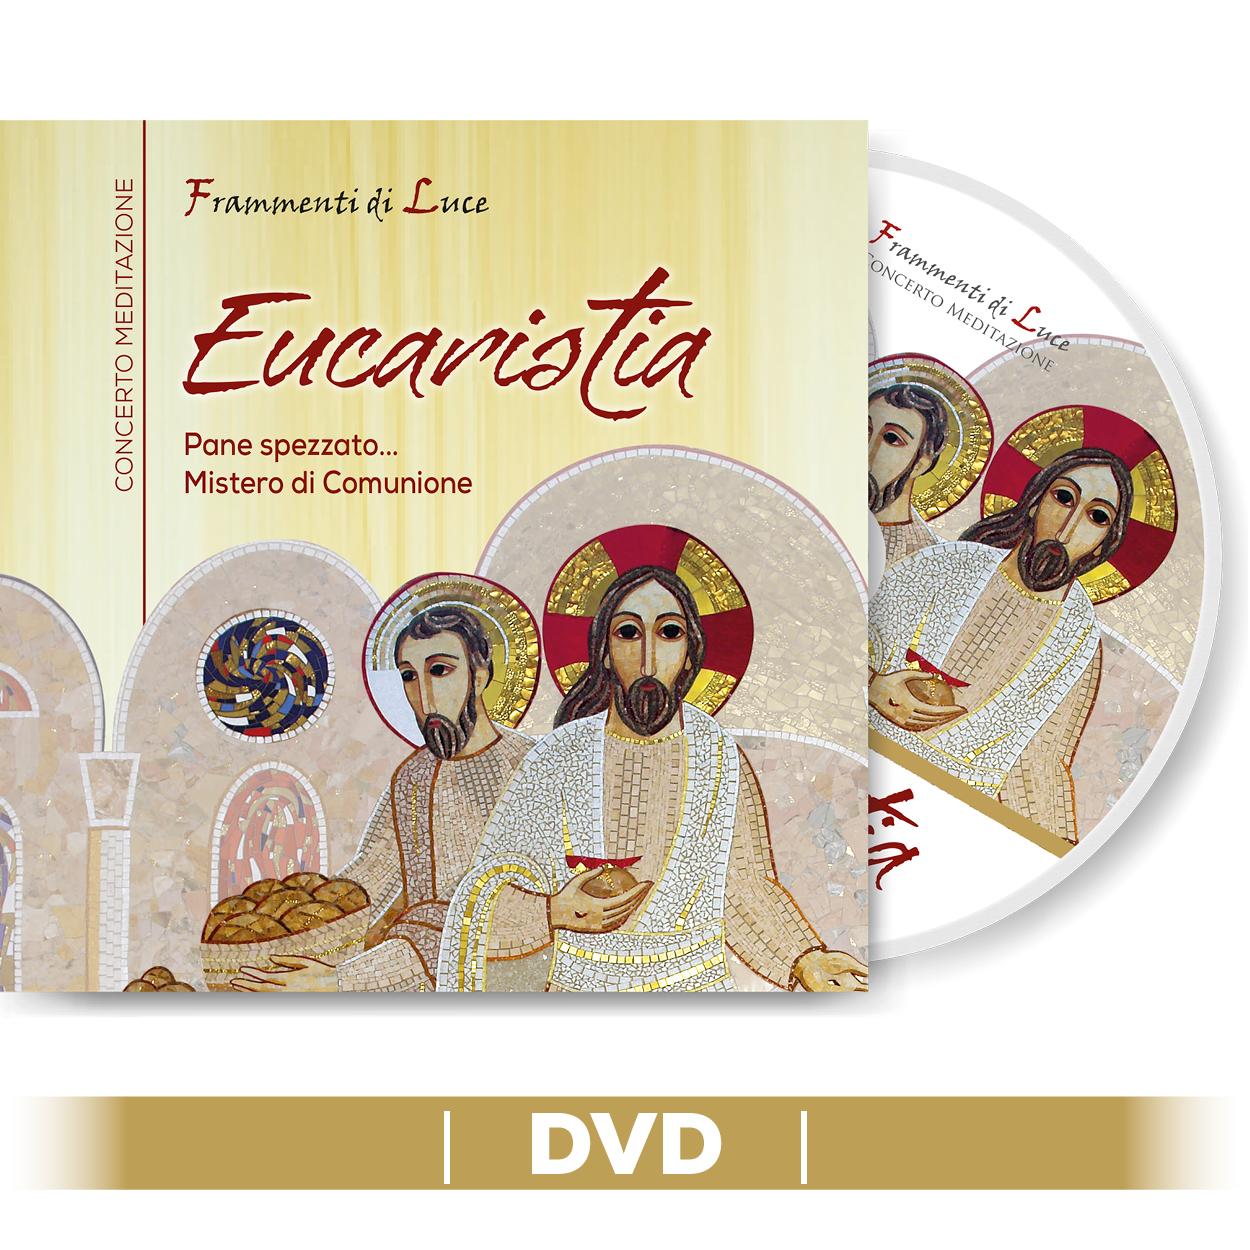 DVD - Eucaristia